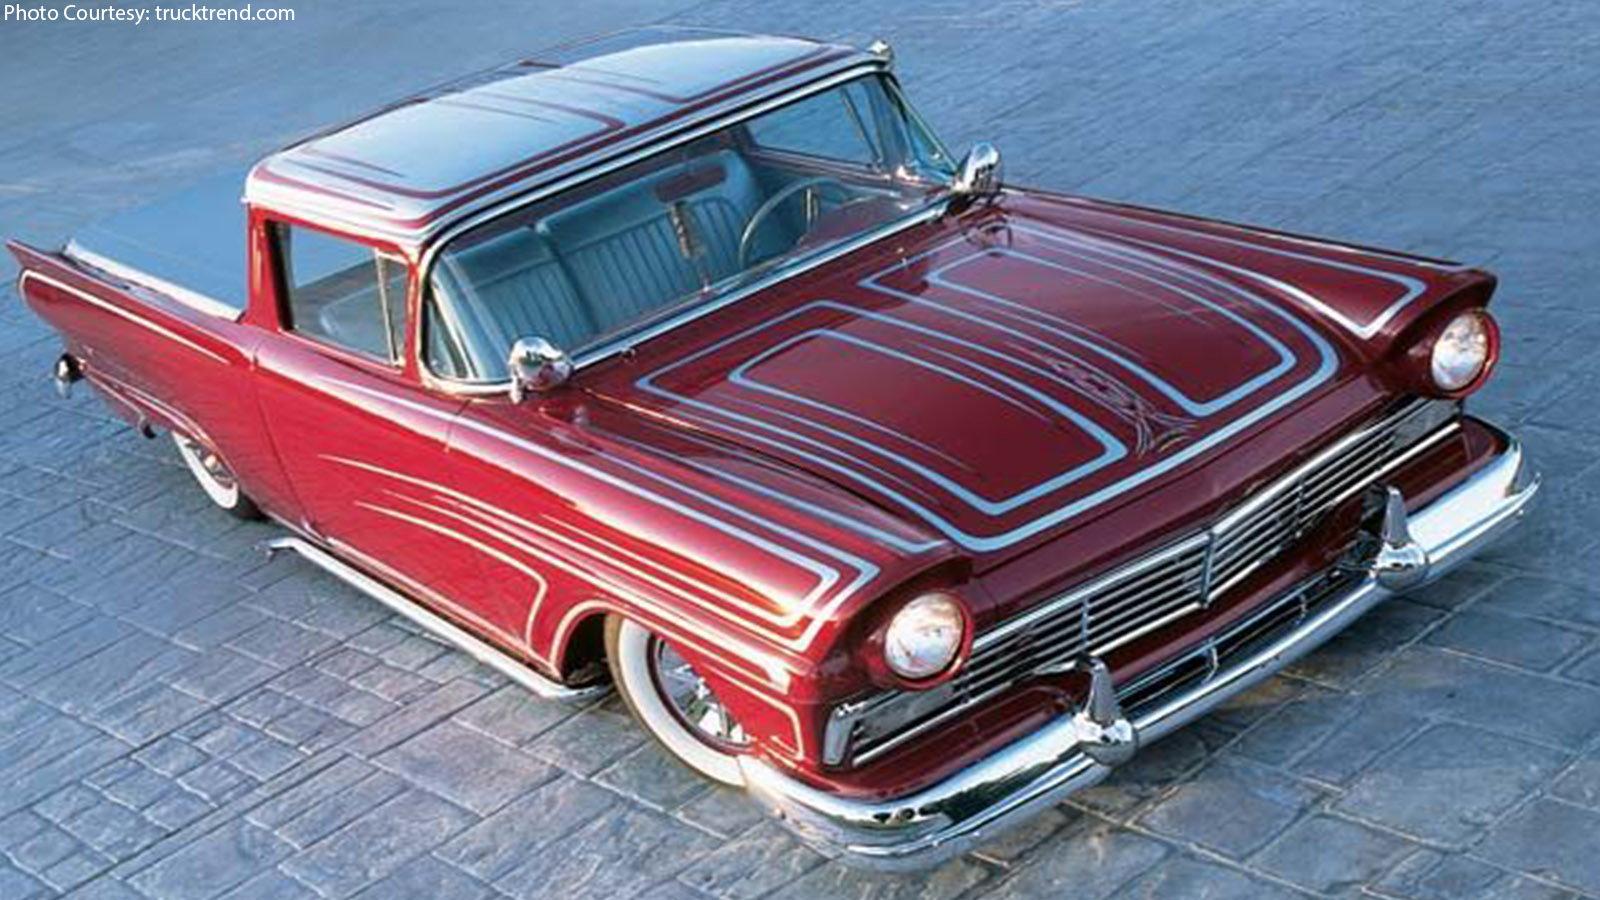 Ranchero, 1957, Classic